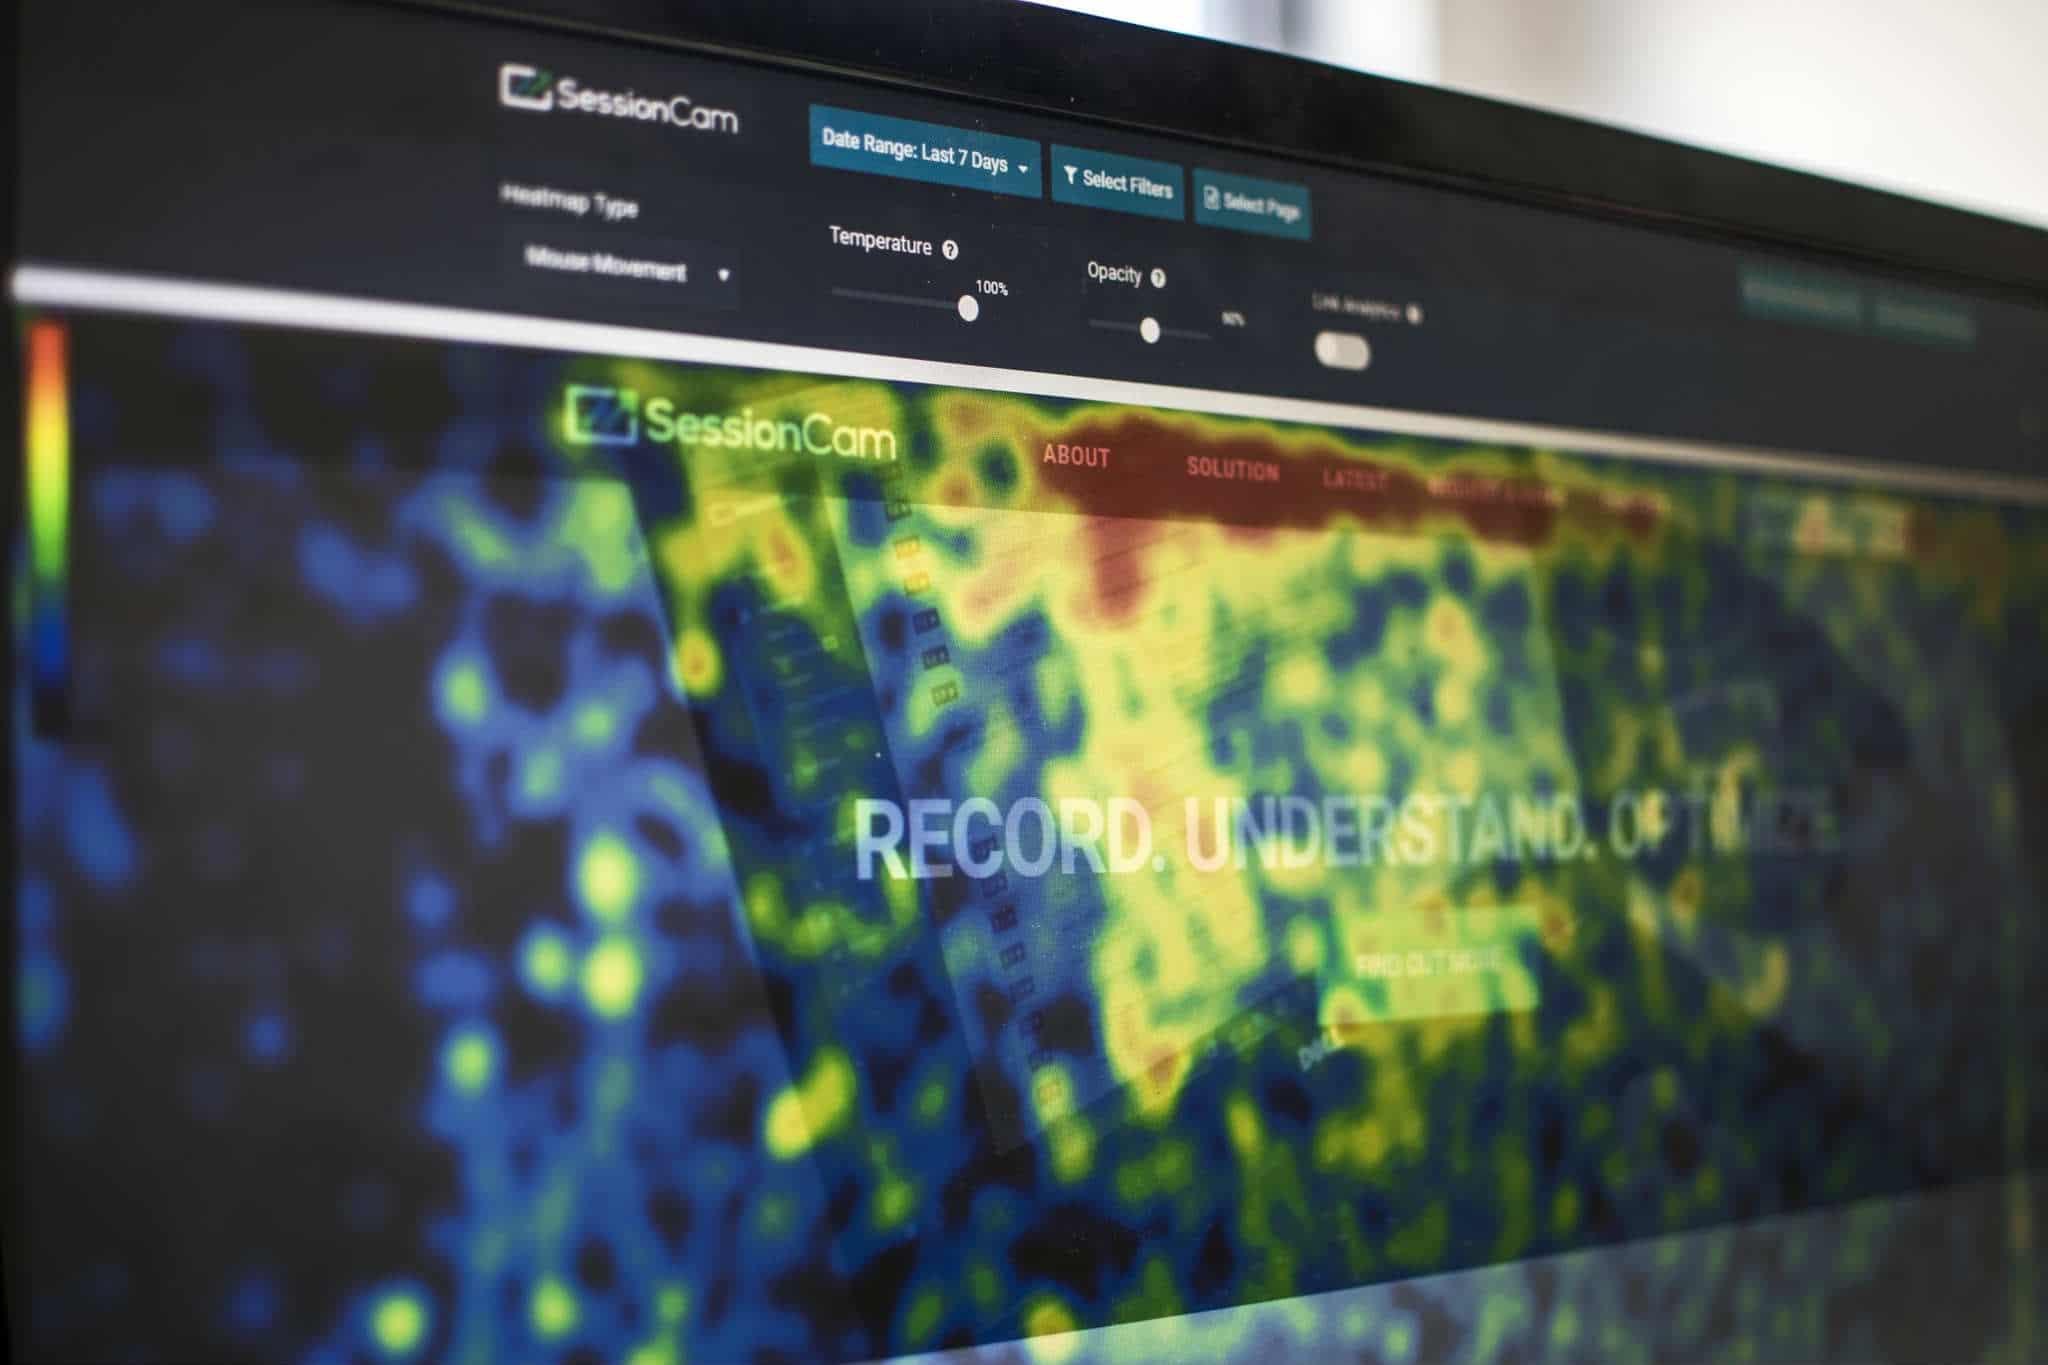 Get Smarter With More Complex Heatmaps